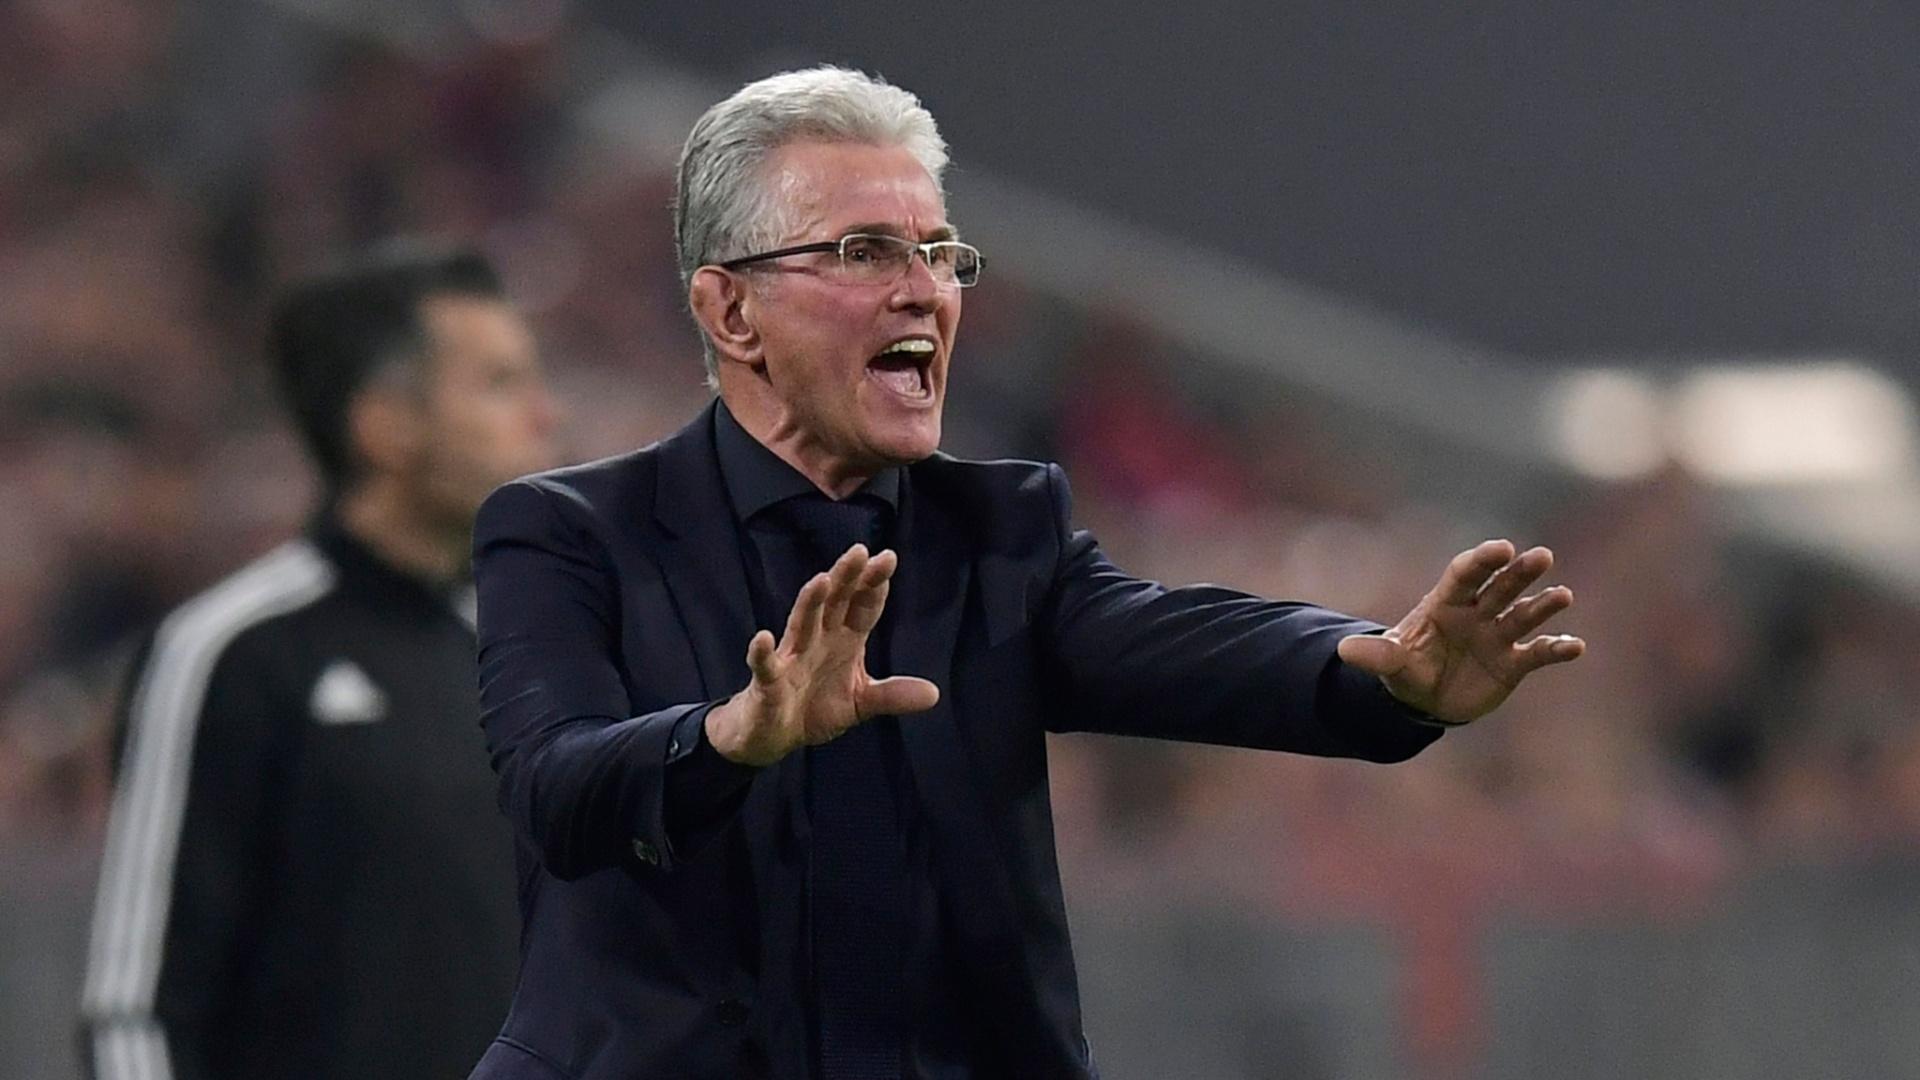 Jupp Heynckes gesticula no jogo do Bayern contra o Real